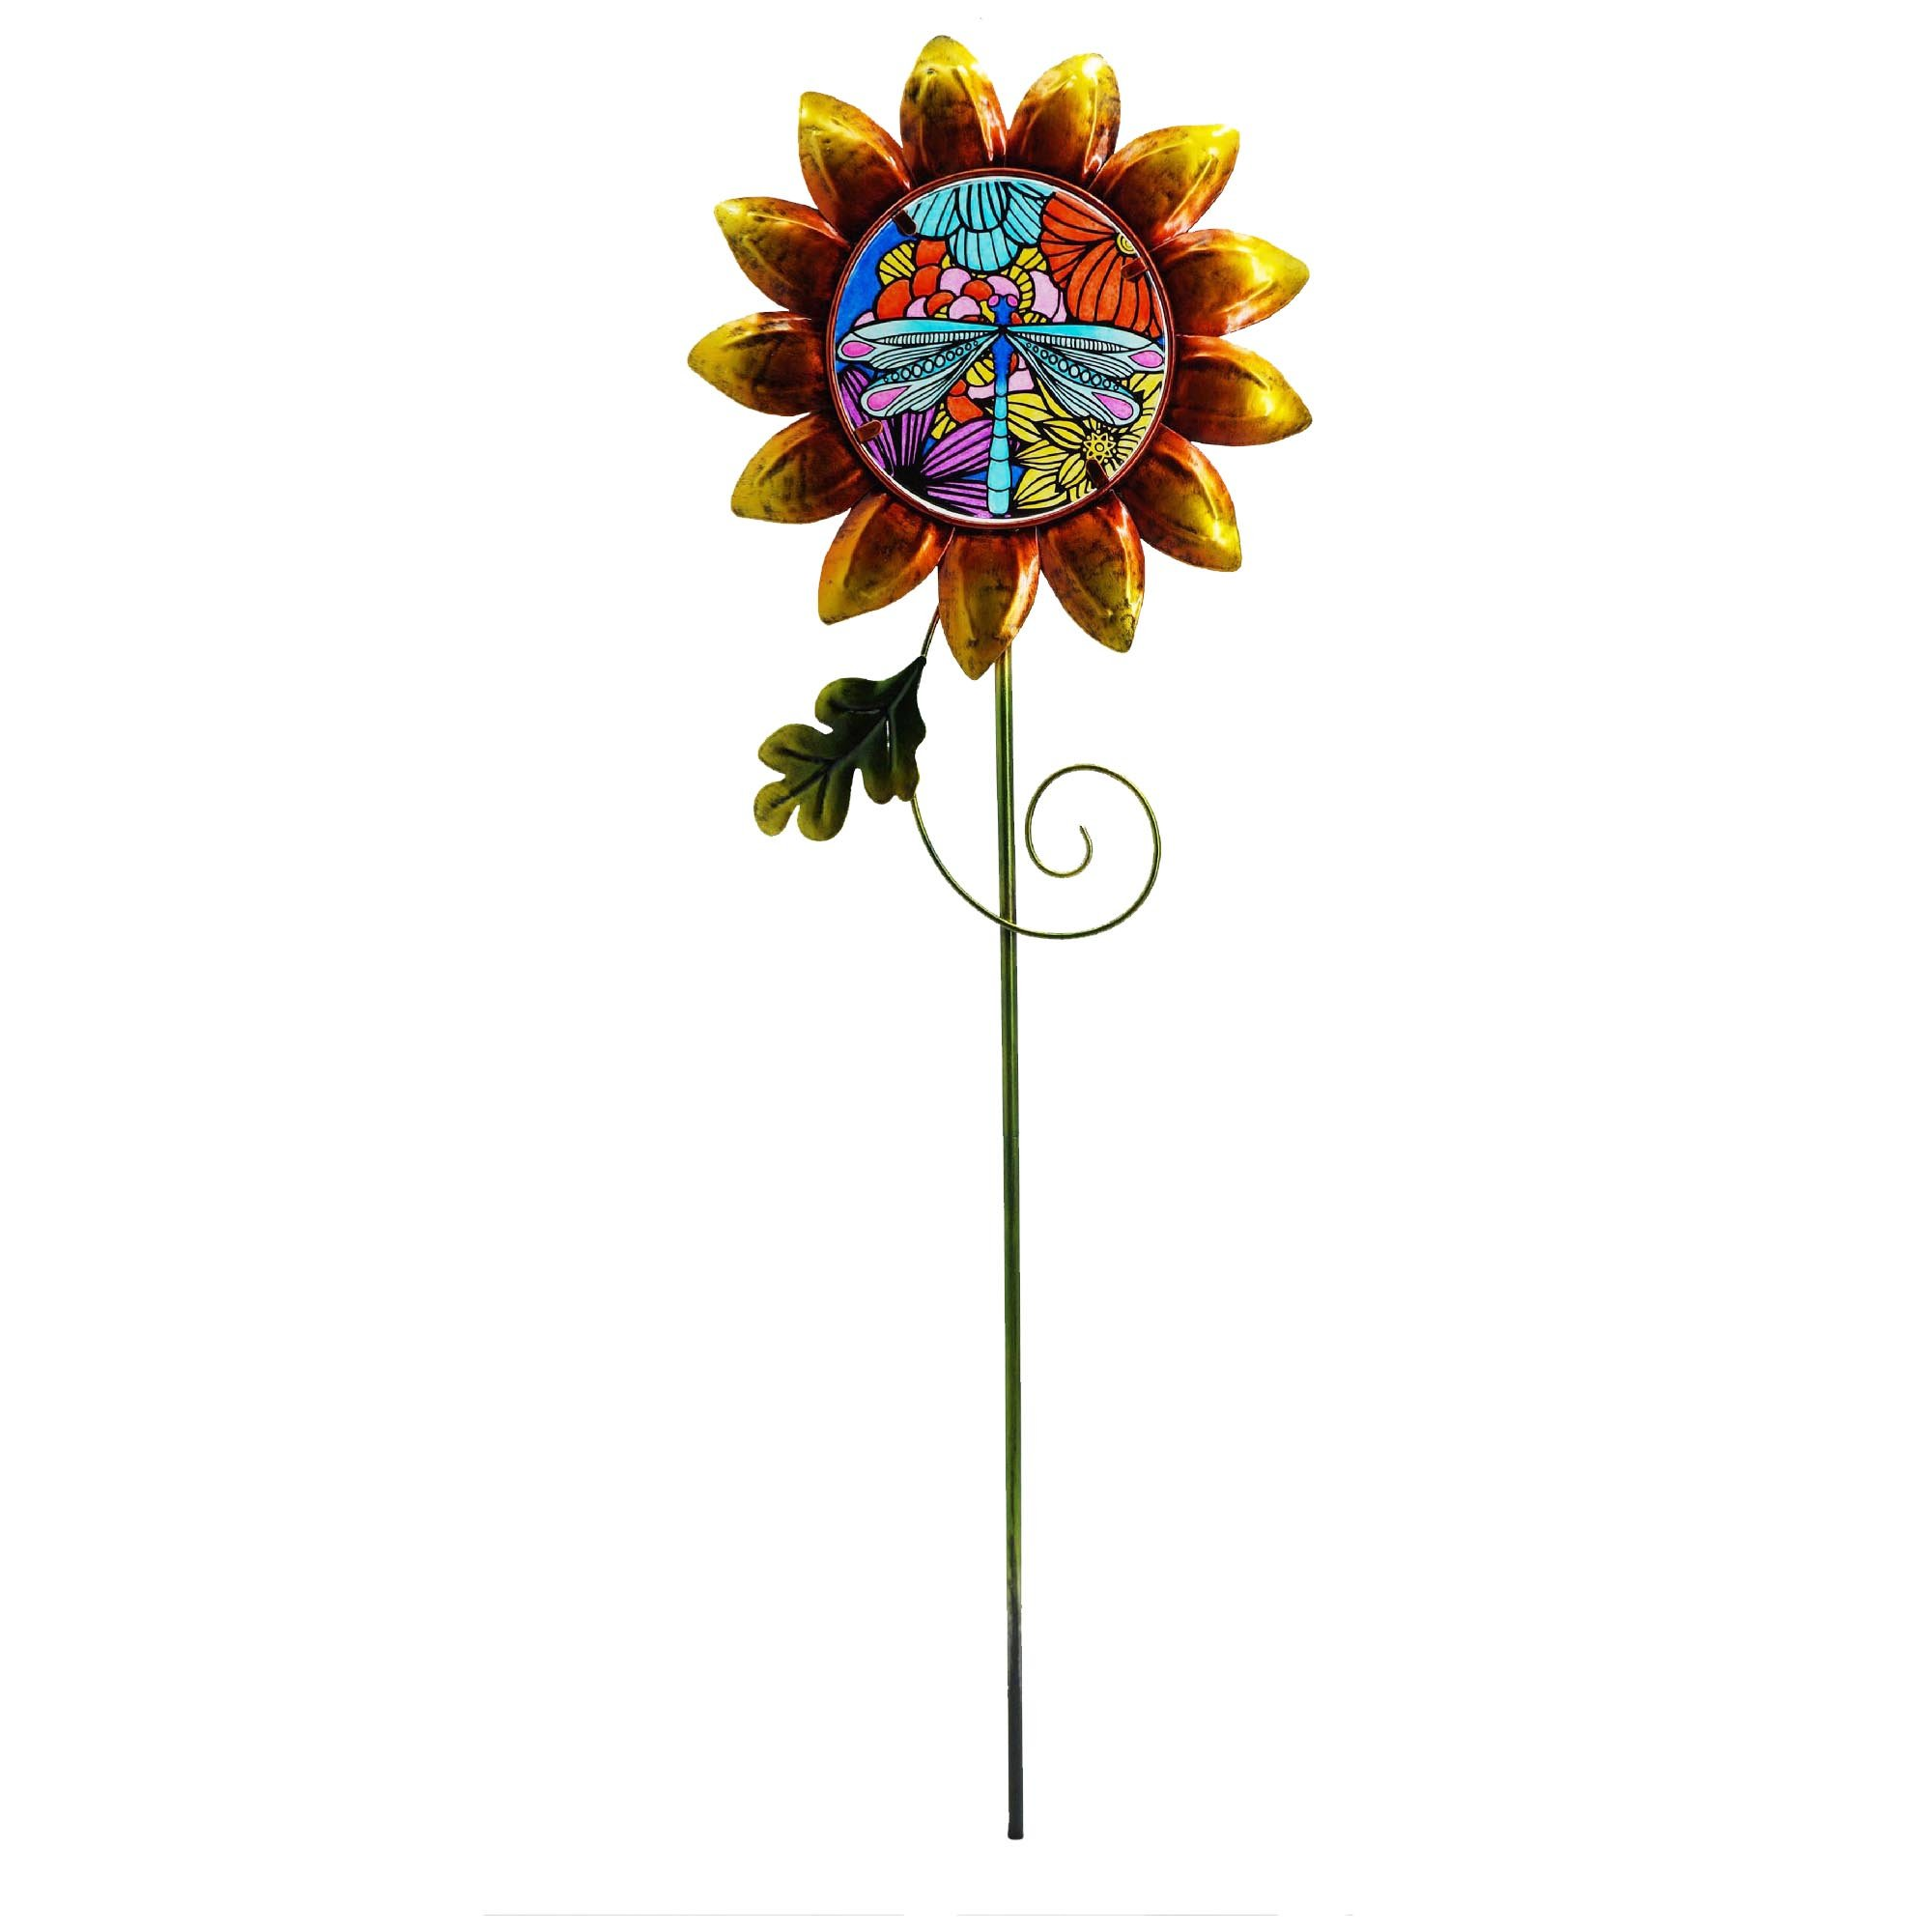 Creative Motion 14289-7 Yard, Garden Décor, 11'' x 0.78'' x 36.875'', Multicolor